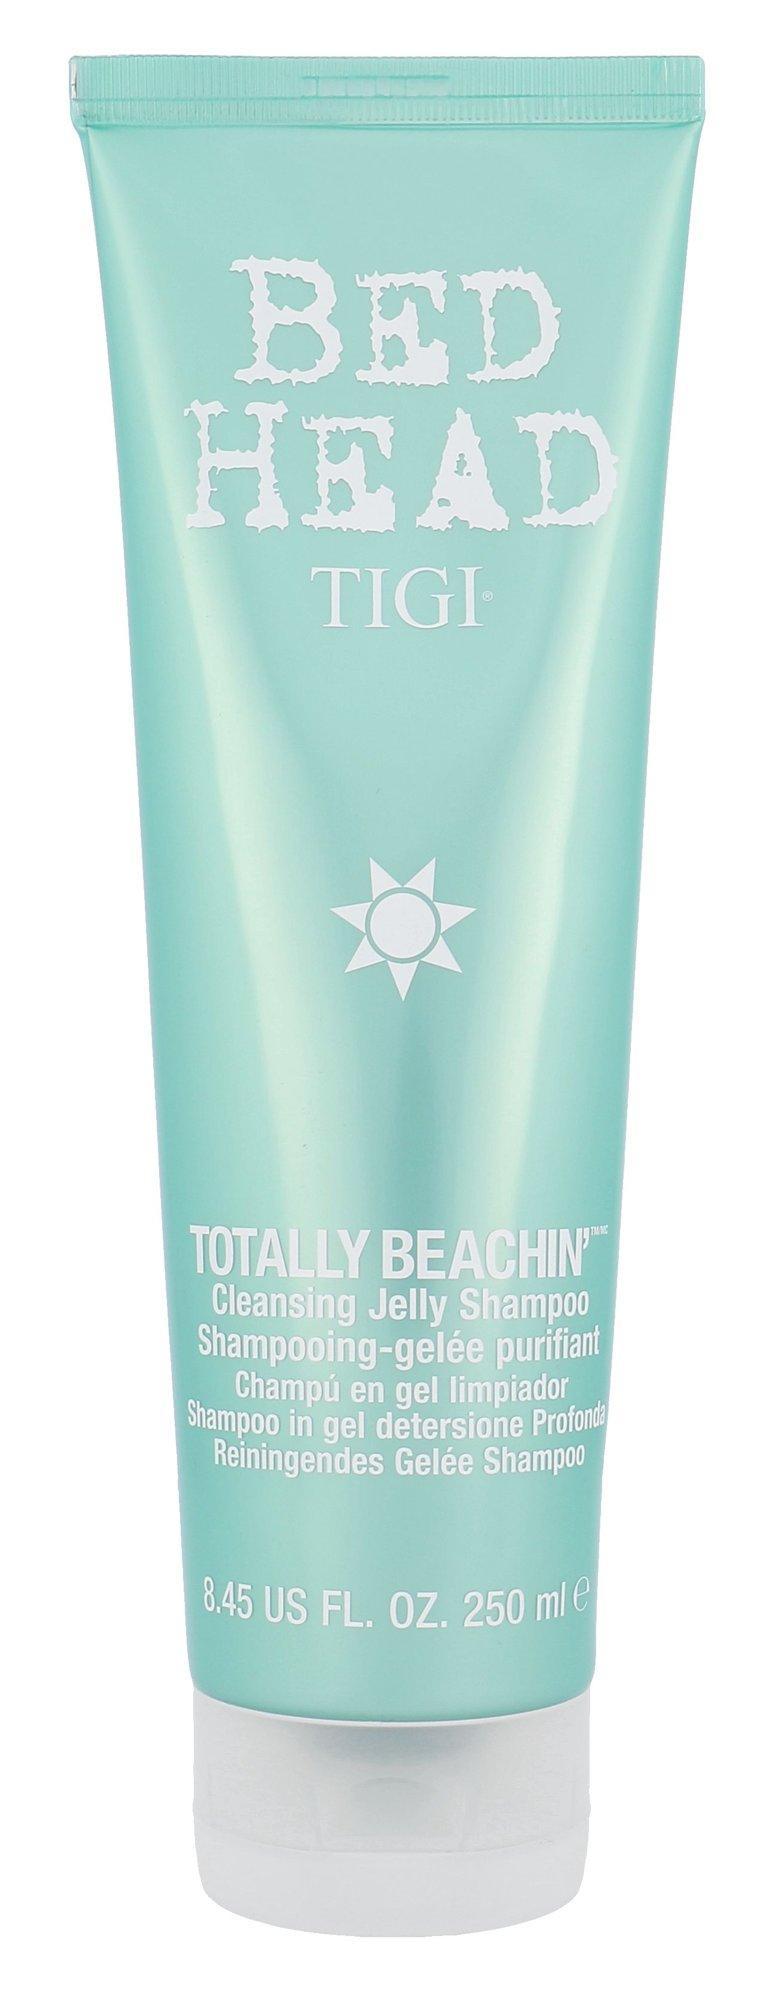 Tigi Bed Head Totally Beachin Cosmetic 250ml